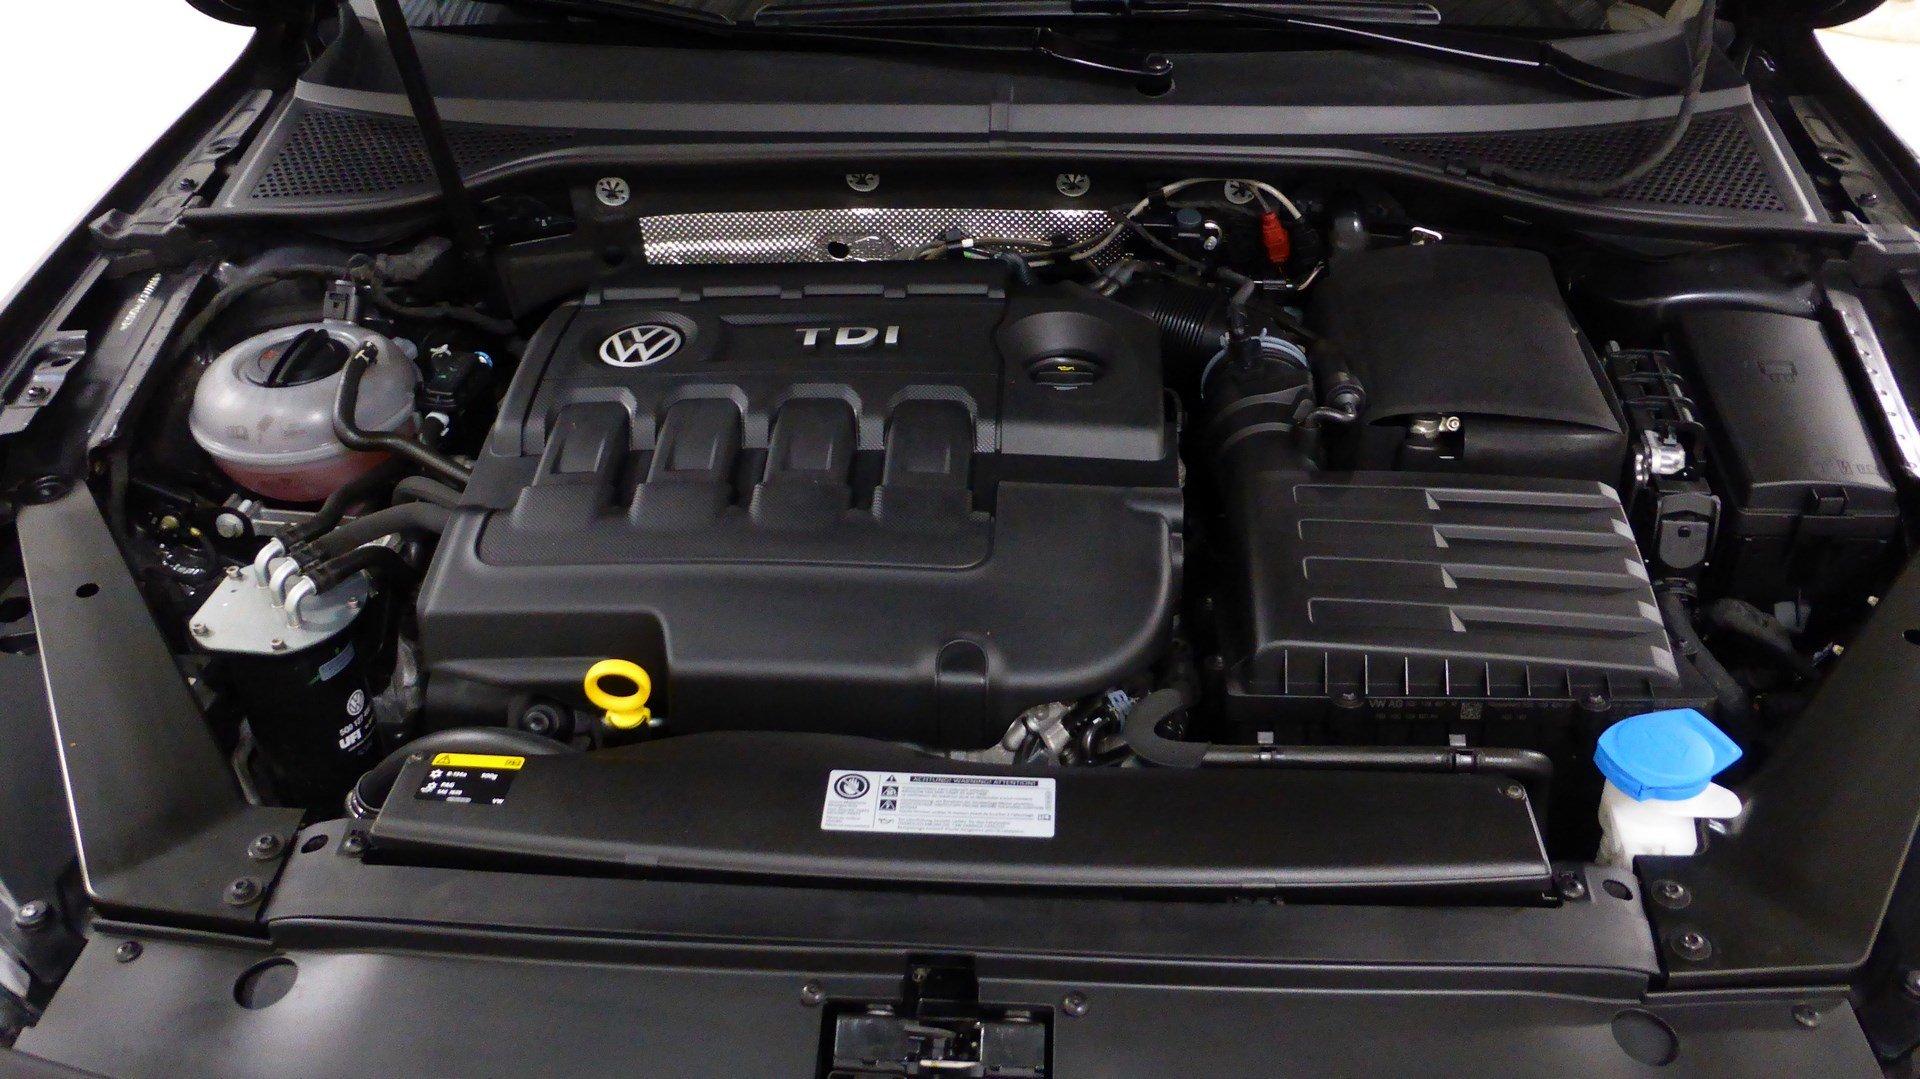 volkswagen passat sw nouvelle break 5 portes diesel 2 0 tdi 150 dsg6 bo te automatique. Black Bedroom Furniture Sets. Home Design Ideas